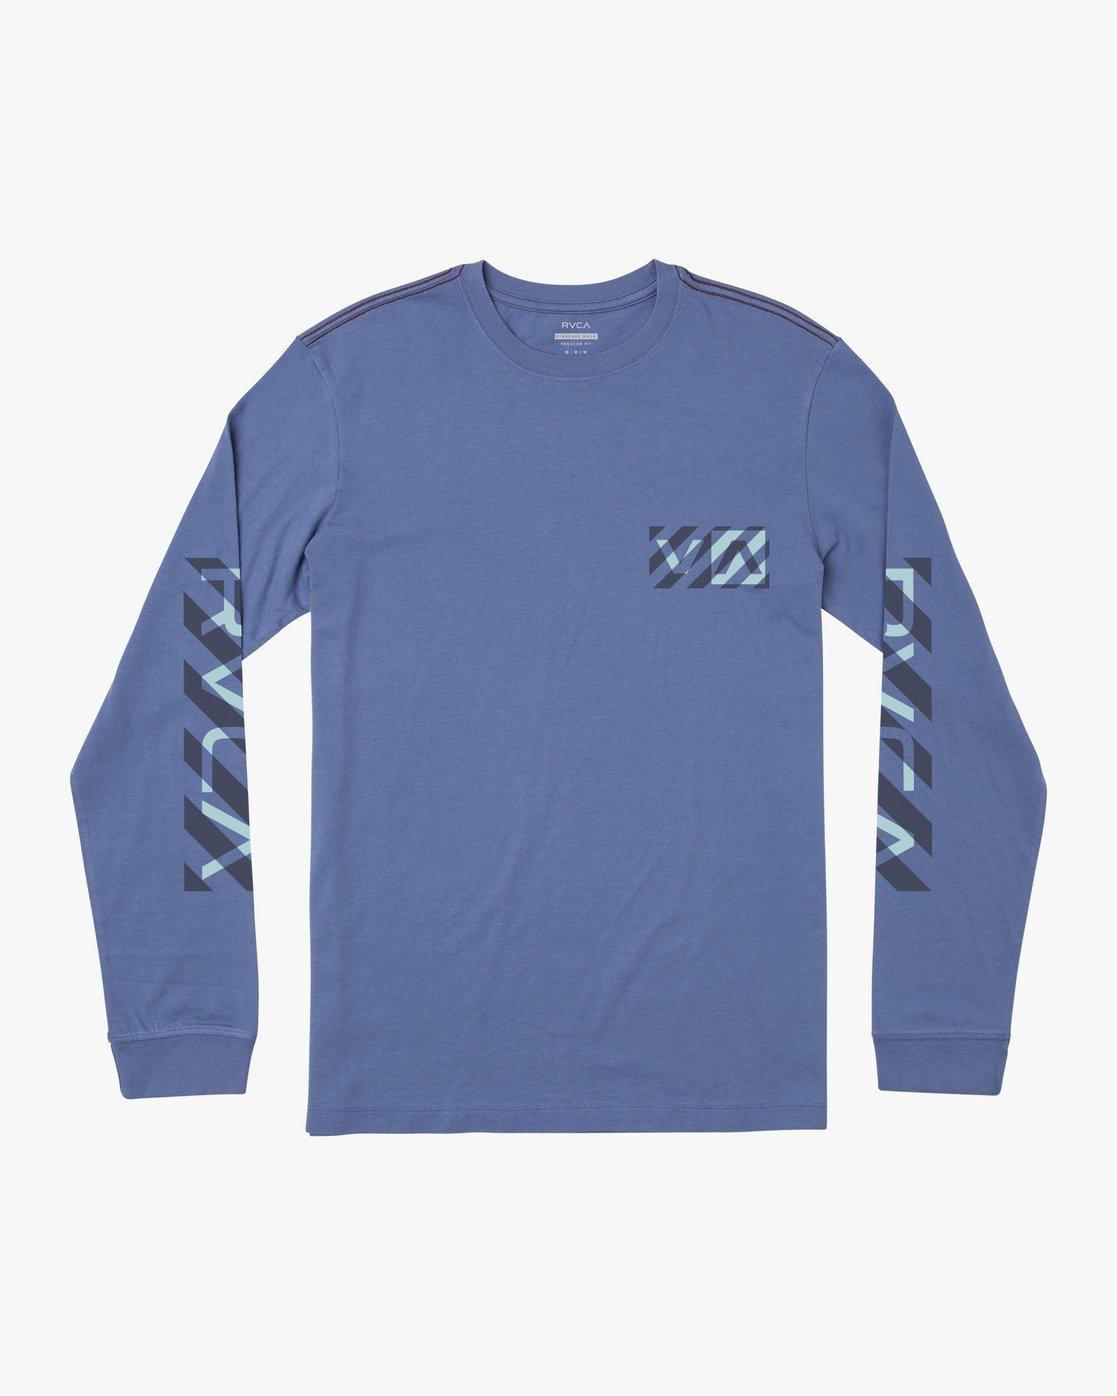 0 HAZARD LONG SLEEVE T-SHIRT Blue M4631RHA RVCA